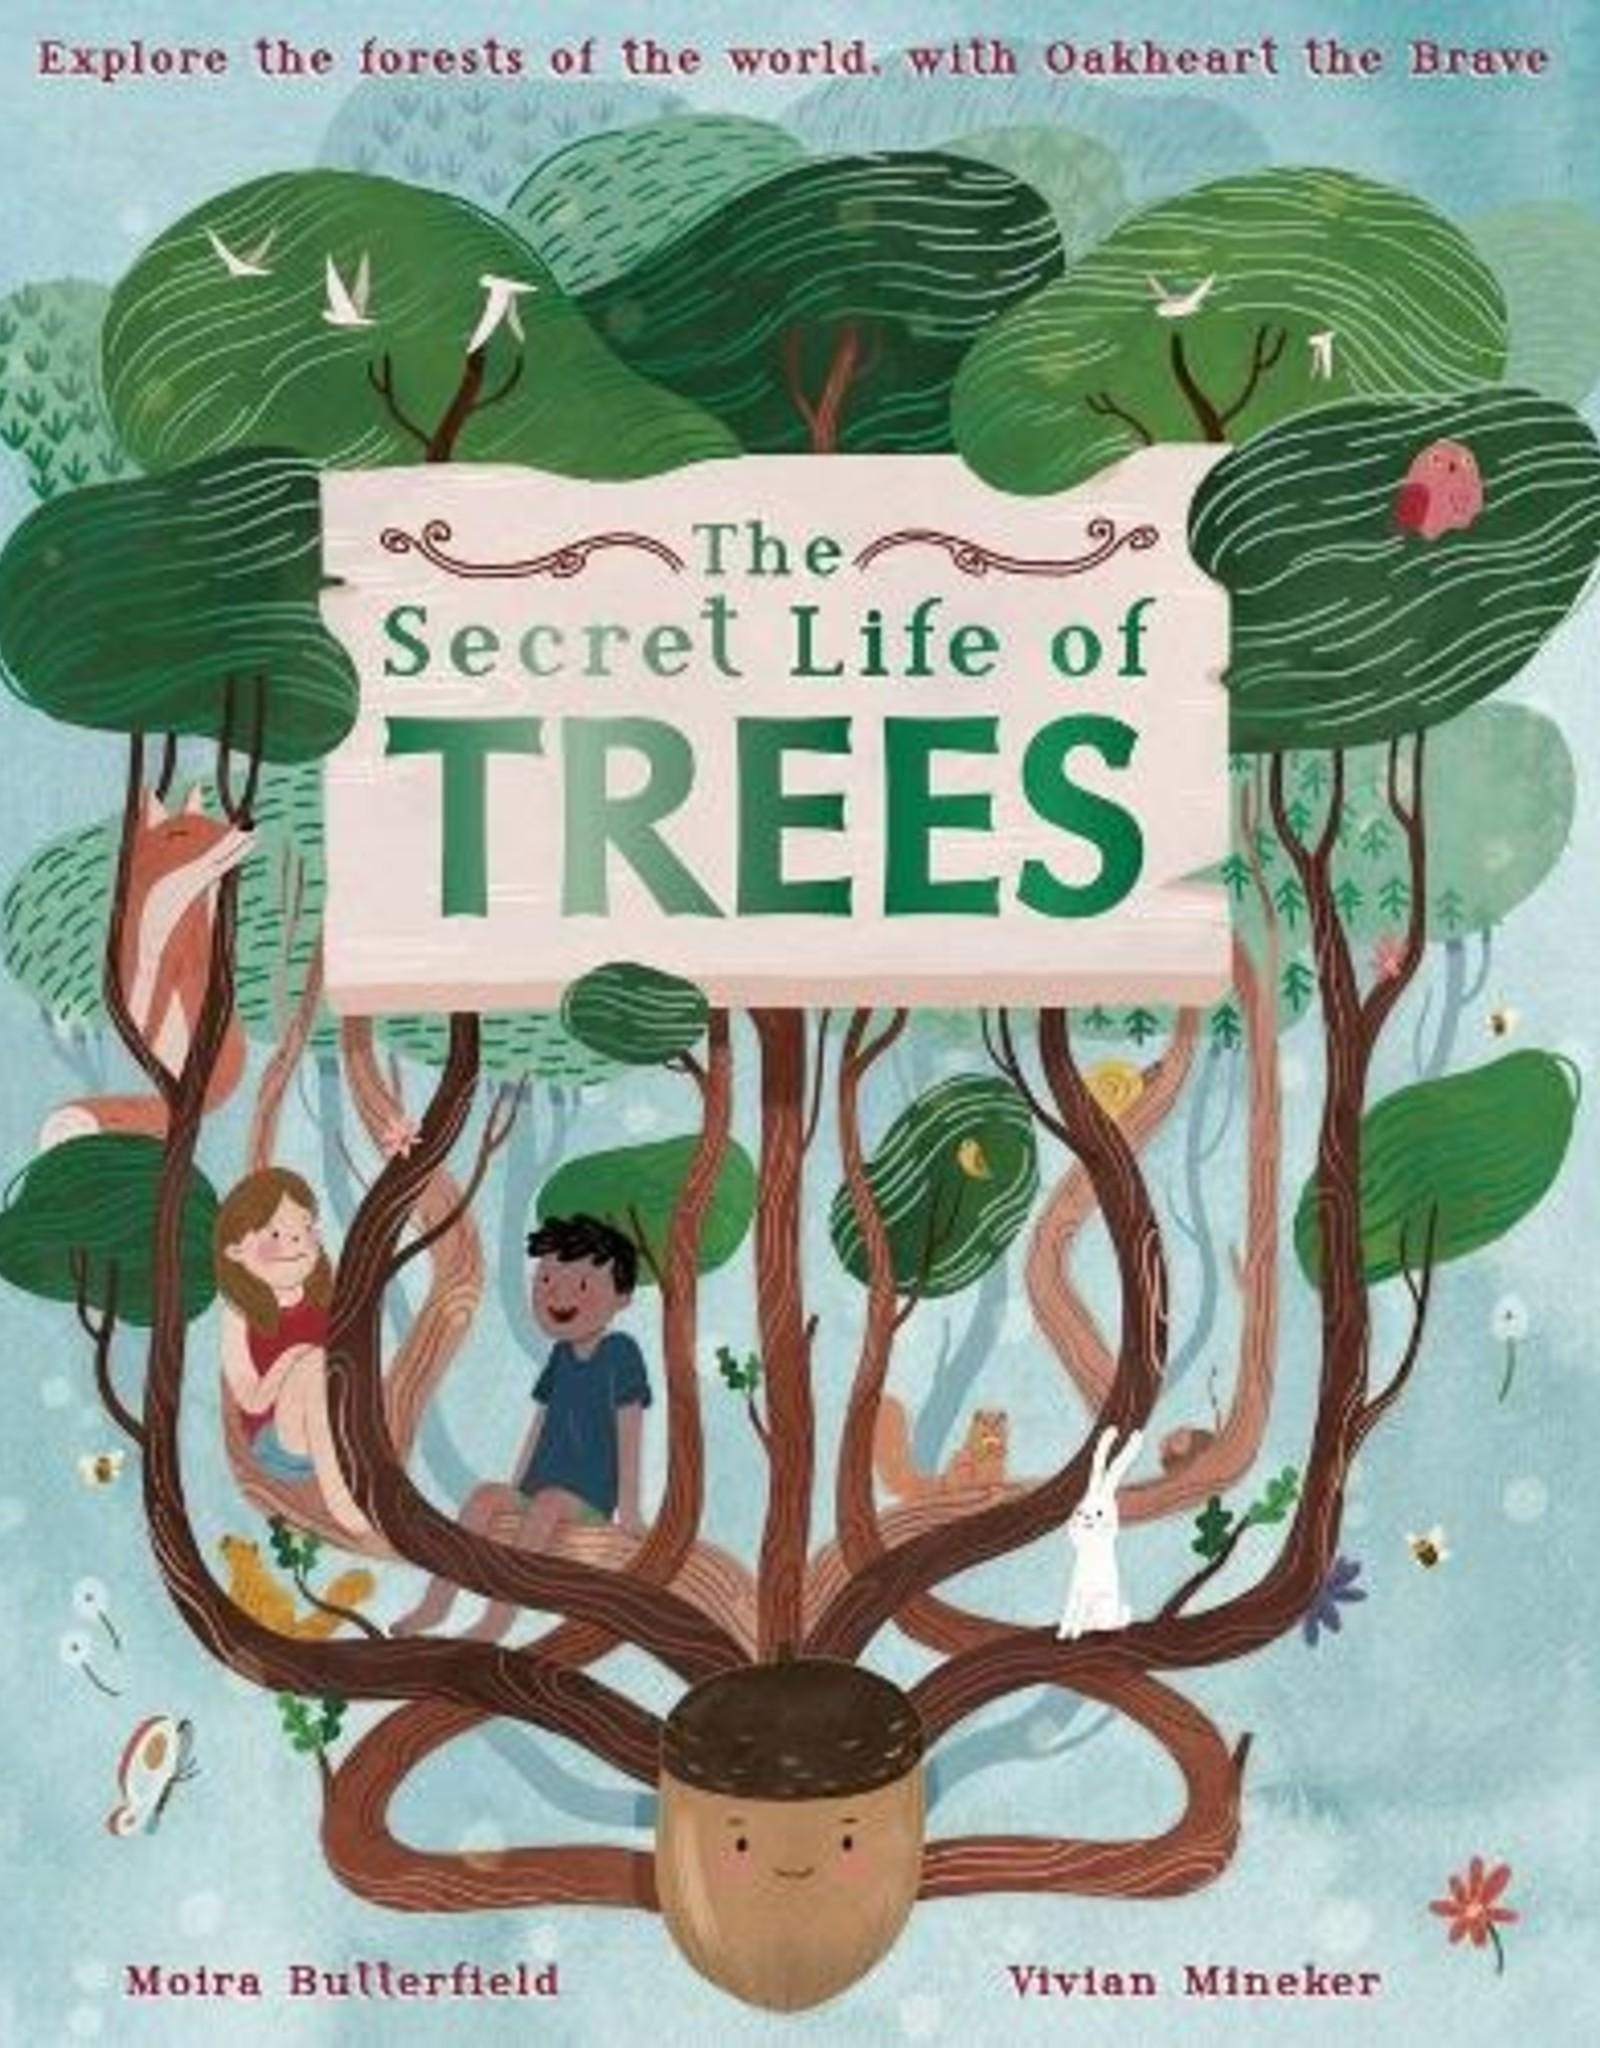 Argosy The Secret Life of Trees- Moira Butterfield/Vivian Mineker